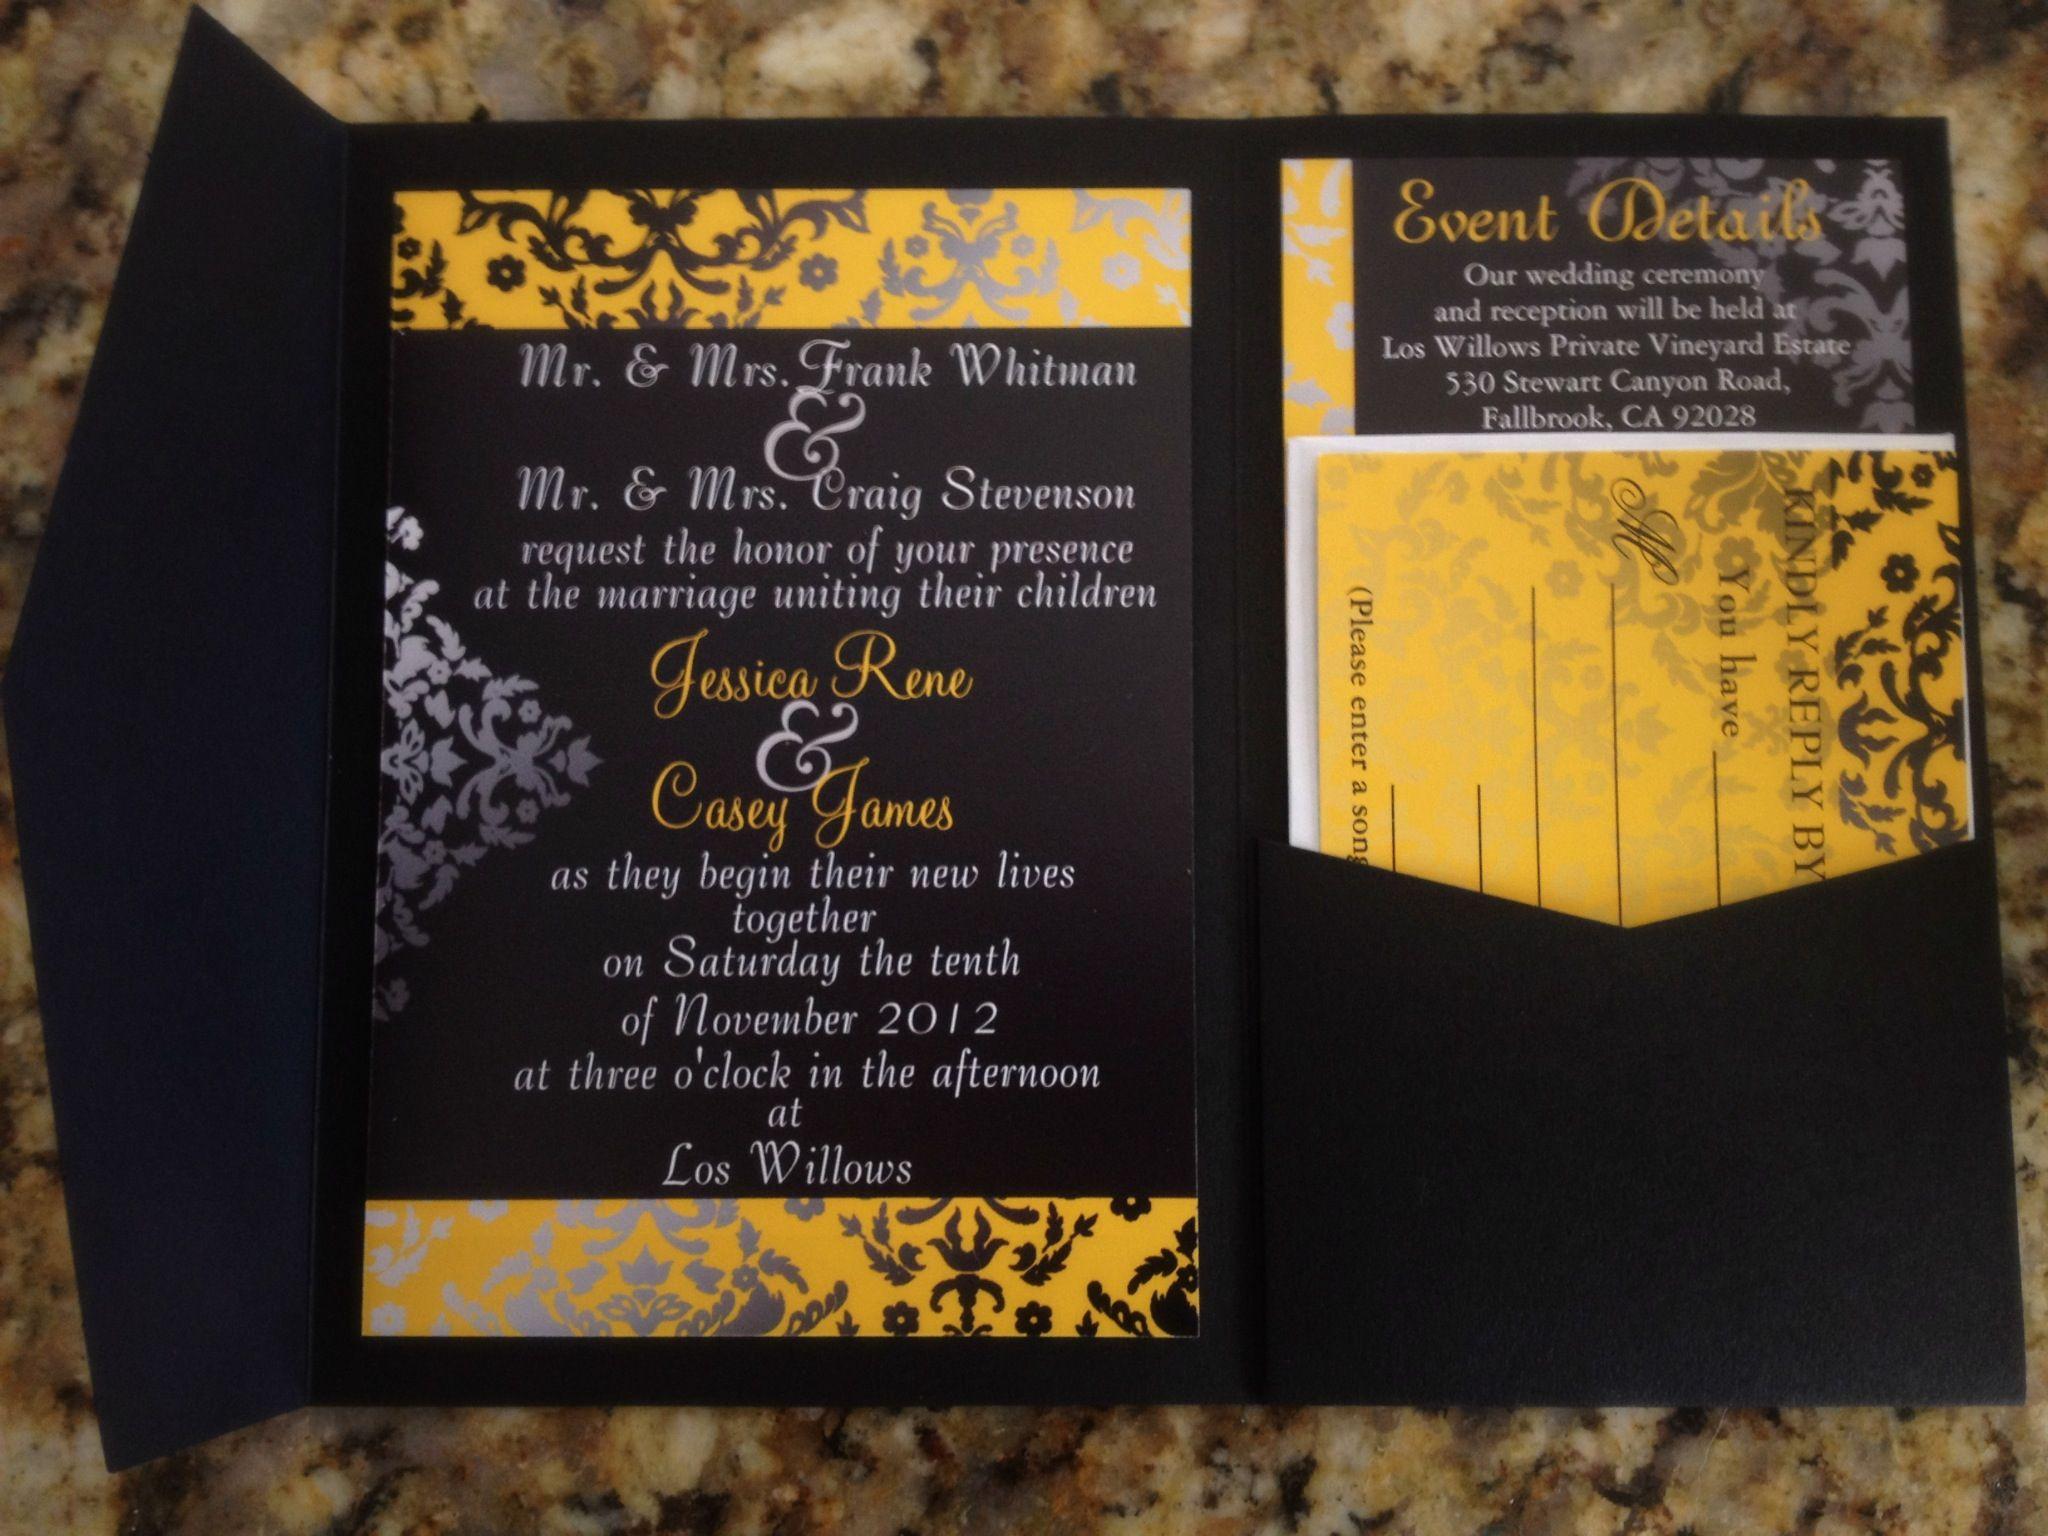 wedding invitations yellow wedding invitations Unique Wedding Invitation Moroccan print yellow black